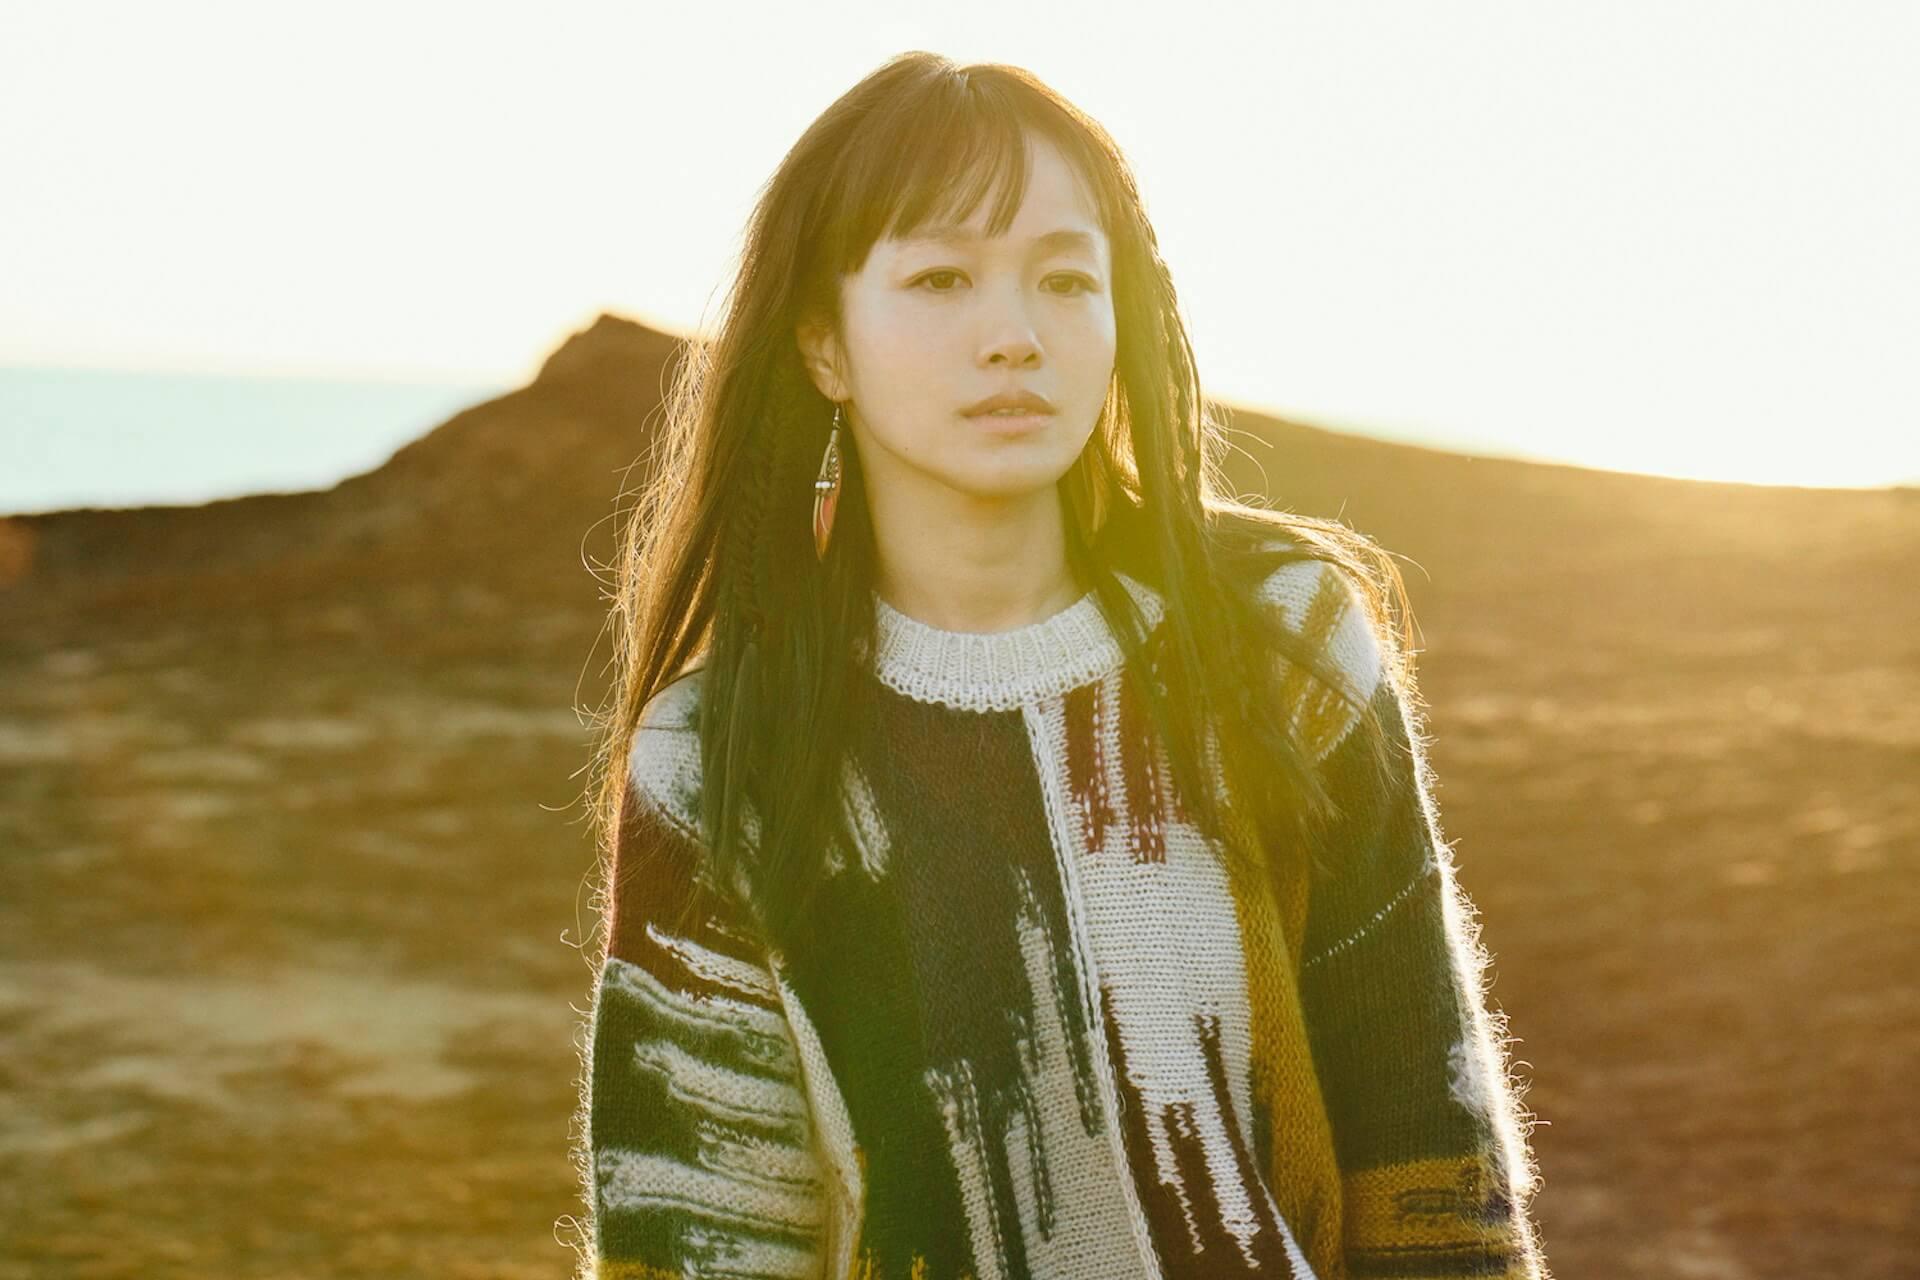 J-WAVE「#音楽を止めるな」プロジェクト無観客ライブにTENDRE、NakamuraEmi、THE CHARM PARKらが登場! music200417_ongakuwotomeruna_02